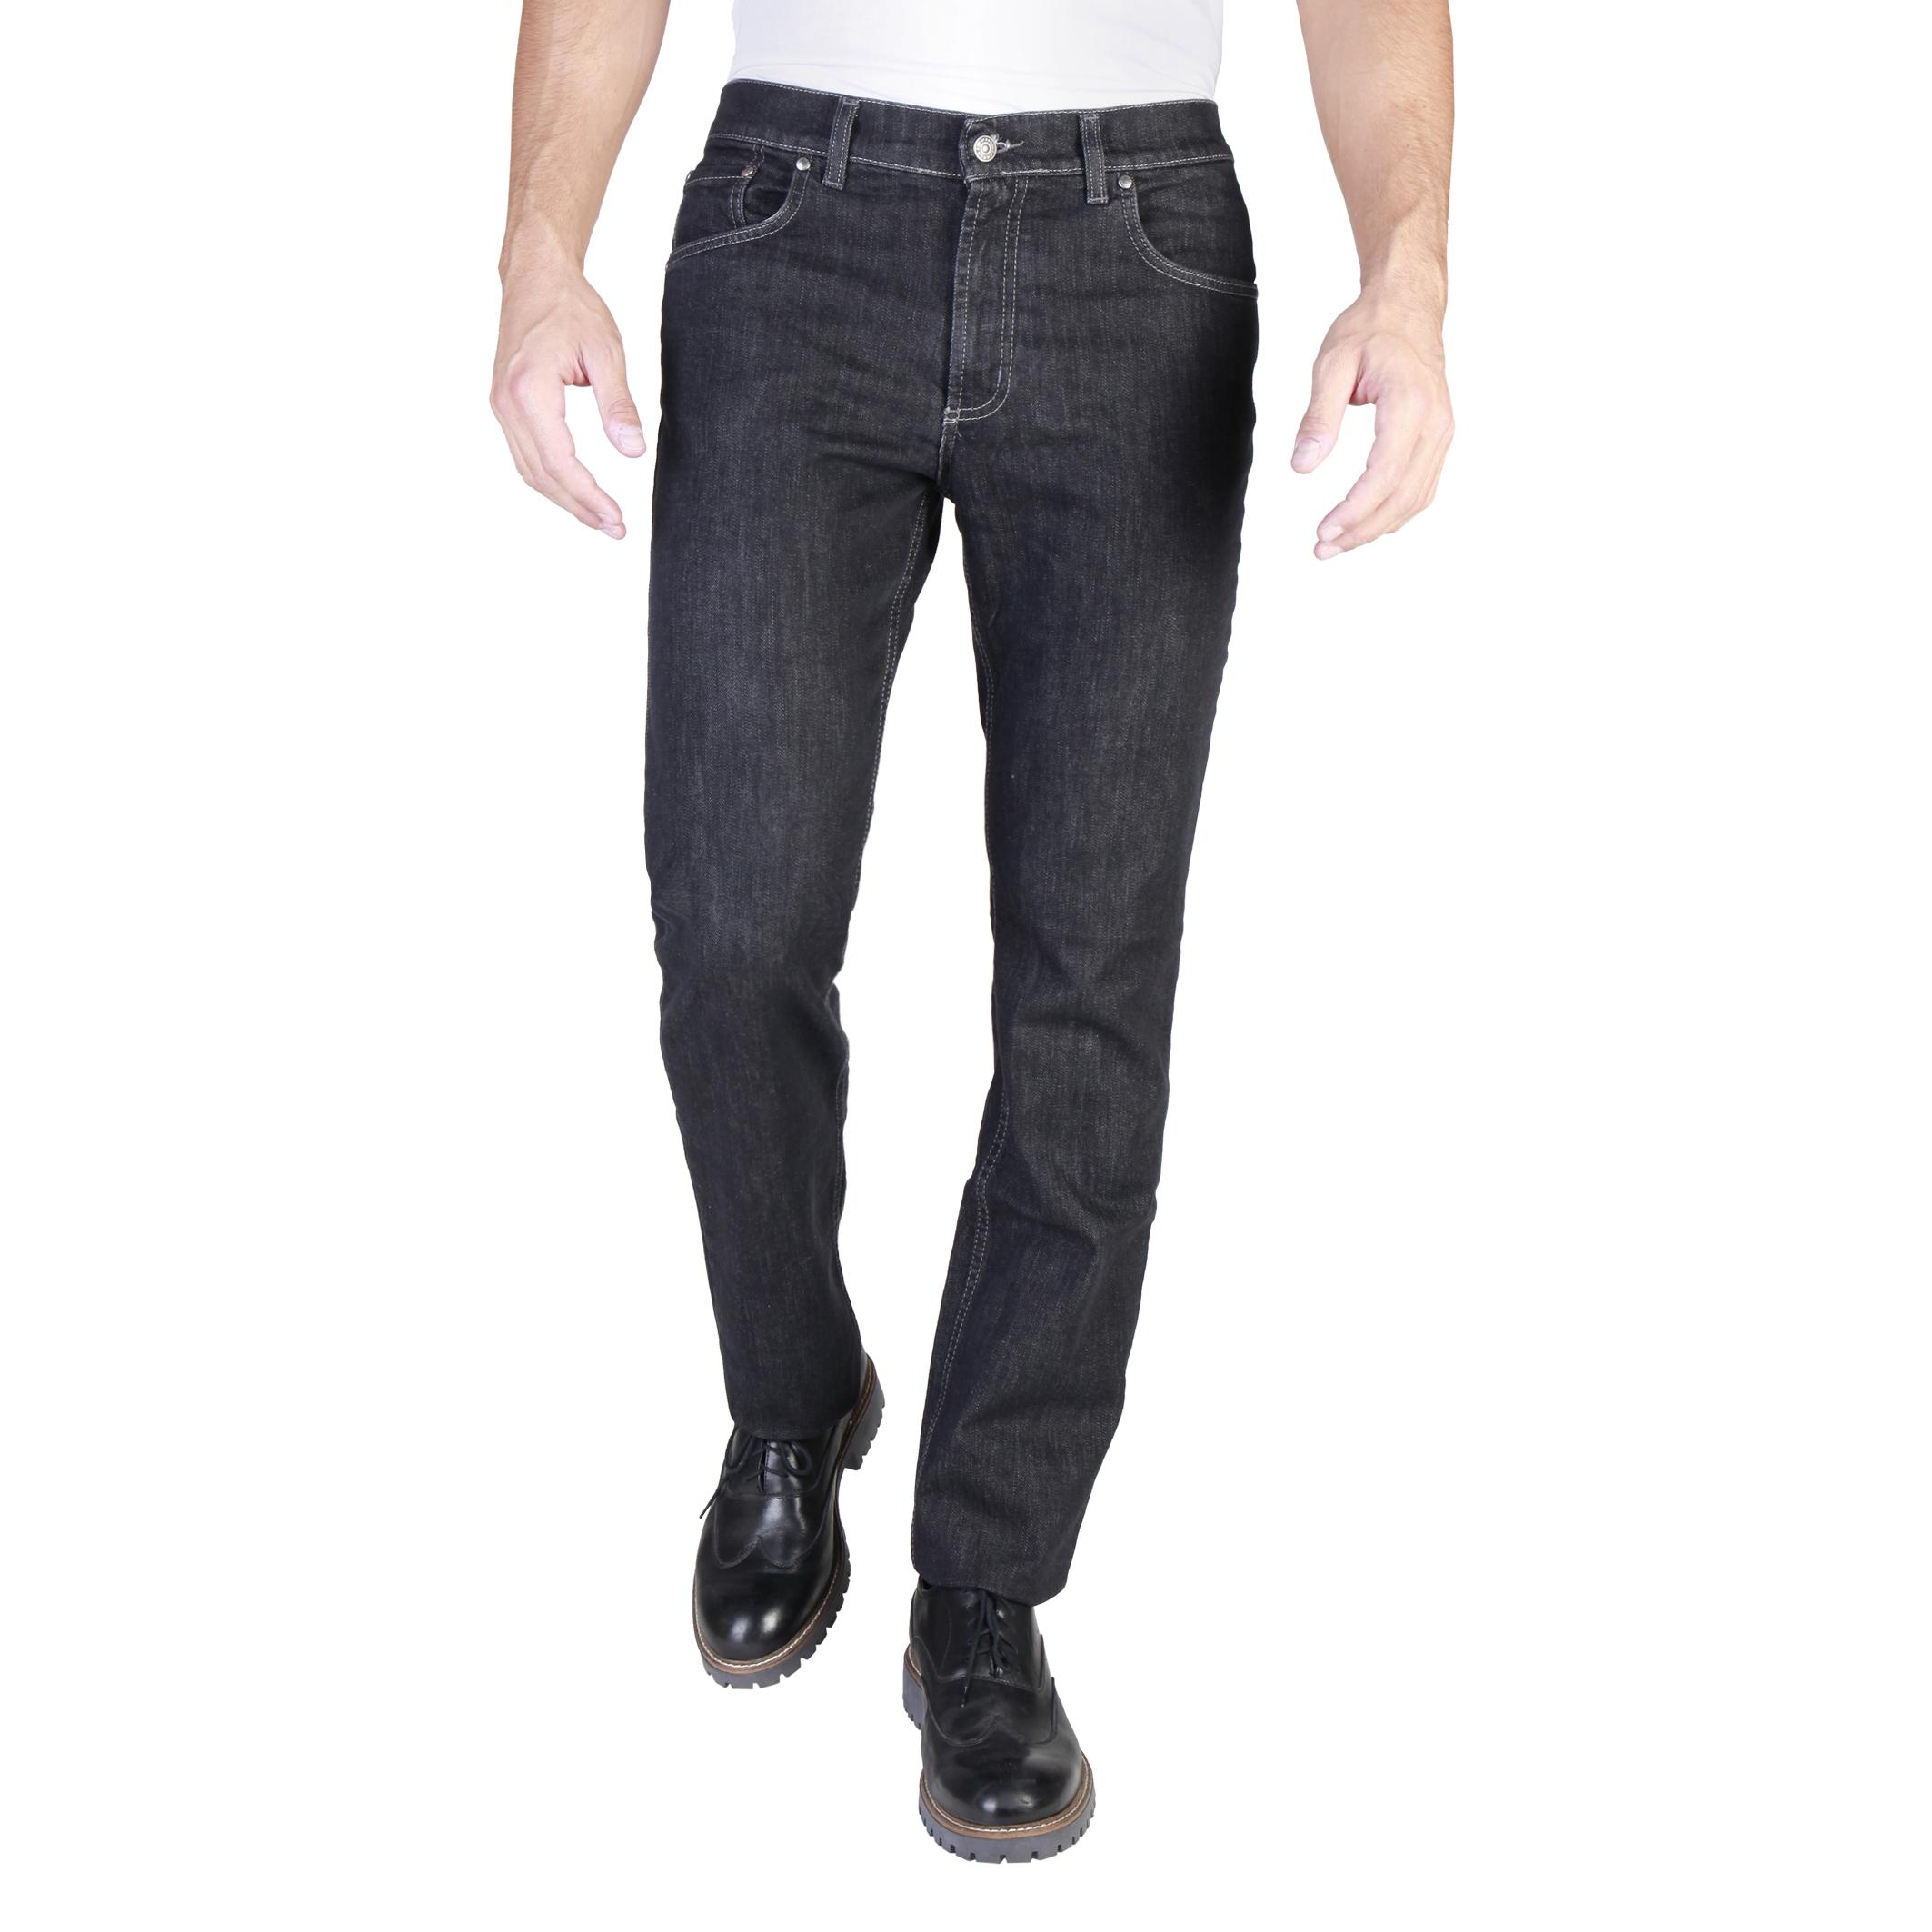 Jeans Carrera Jeans 000700_0921S Uomo Nero 85304